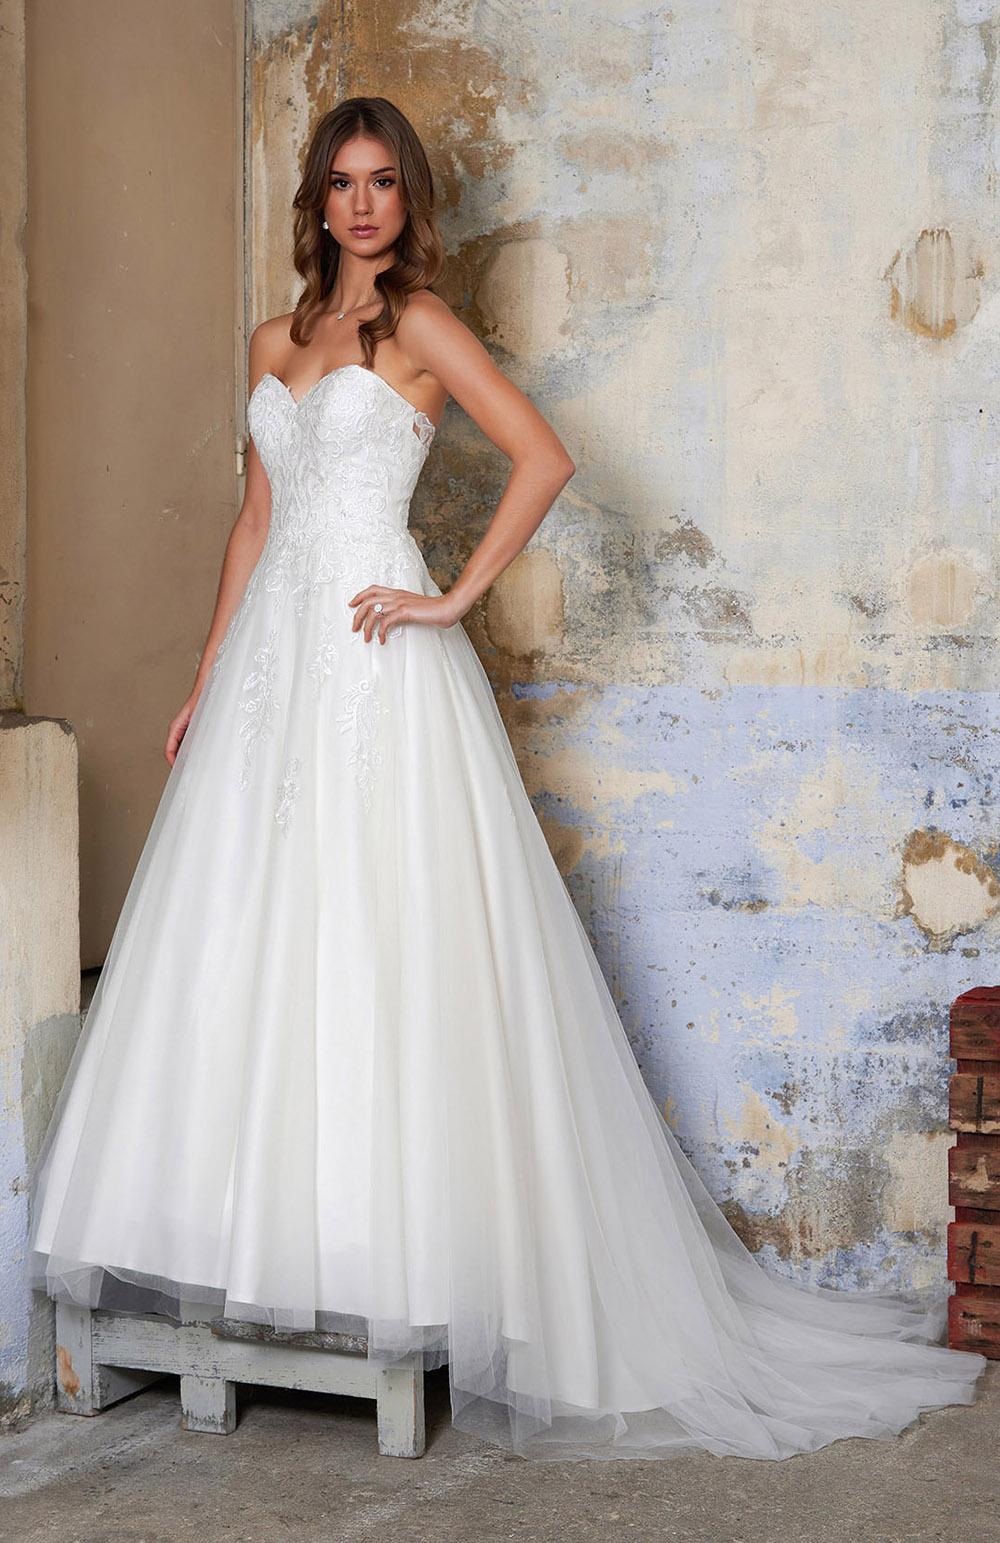 Robe de mariée Modèle Juliana